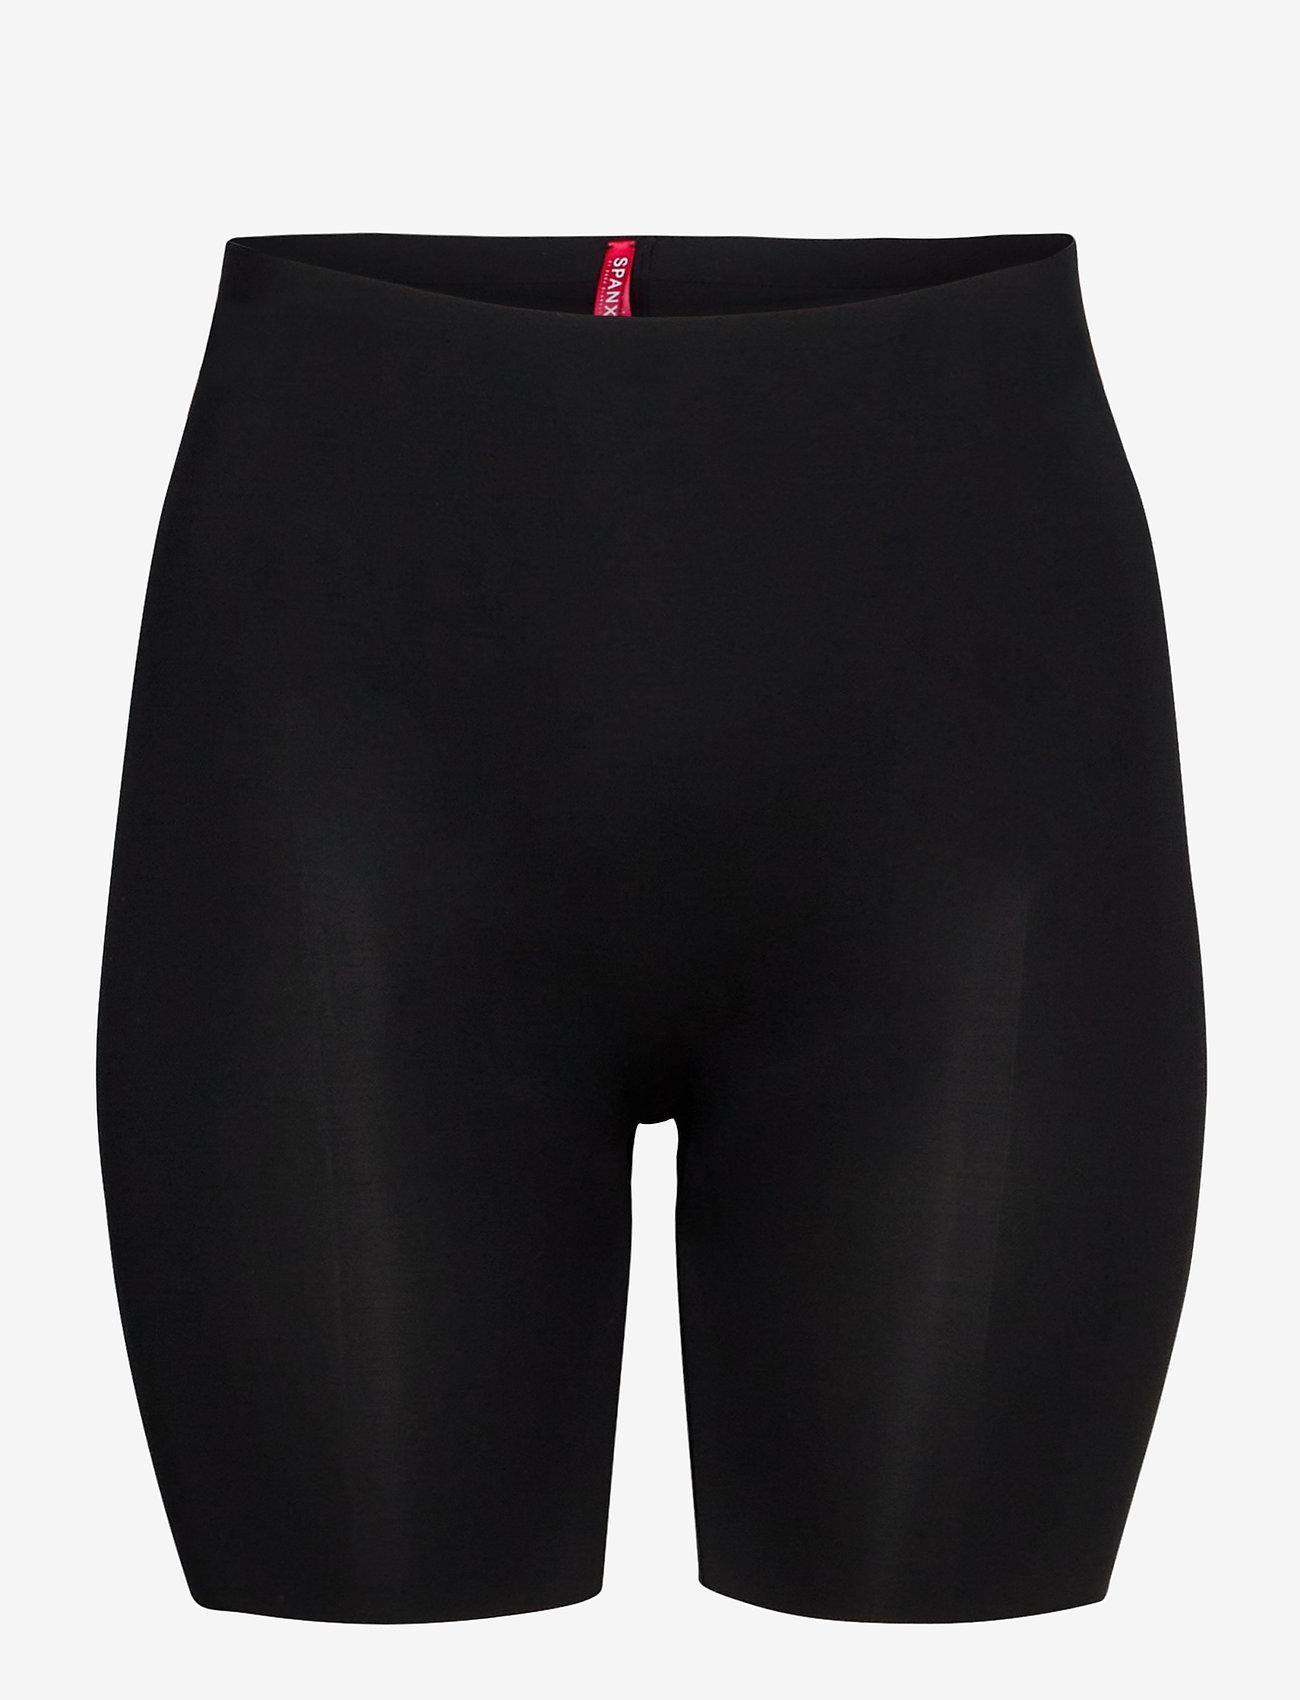 Spanx - SHORT - bottoms - very black - 0